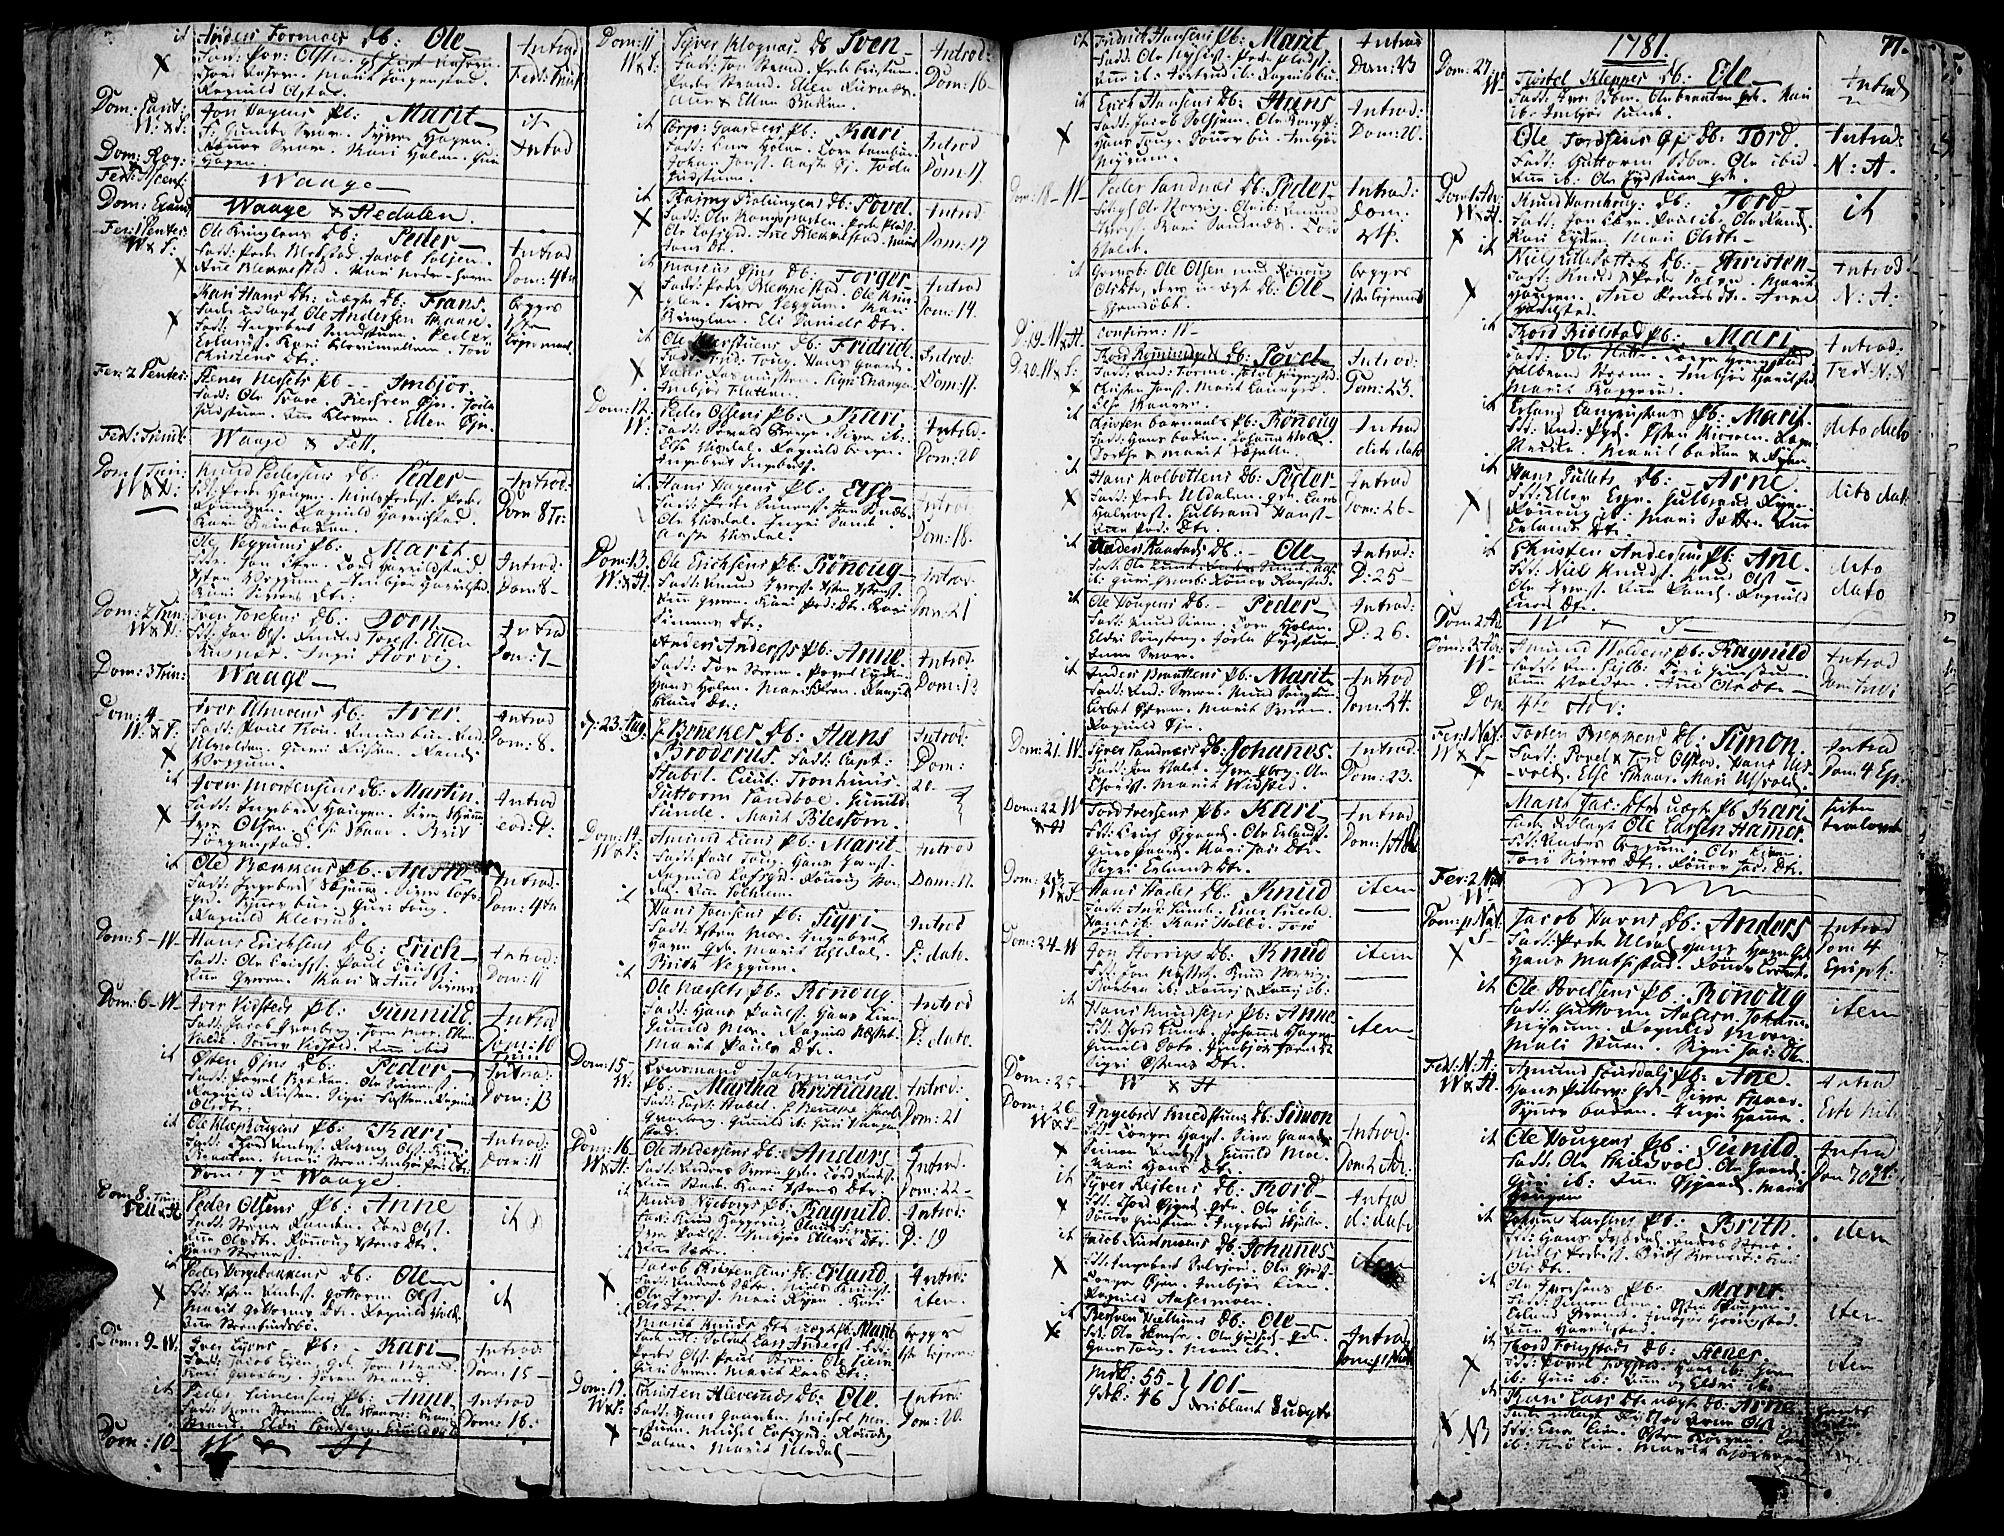 SAH, Vågå prestekontor, Ministerialbok nr. 1, 1739-1810, s. 77